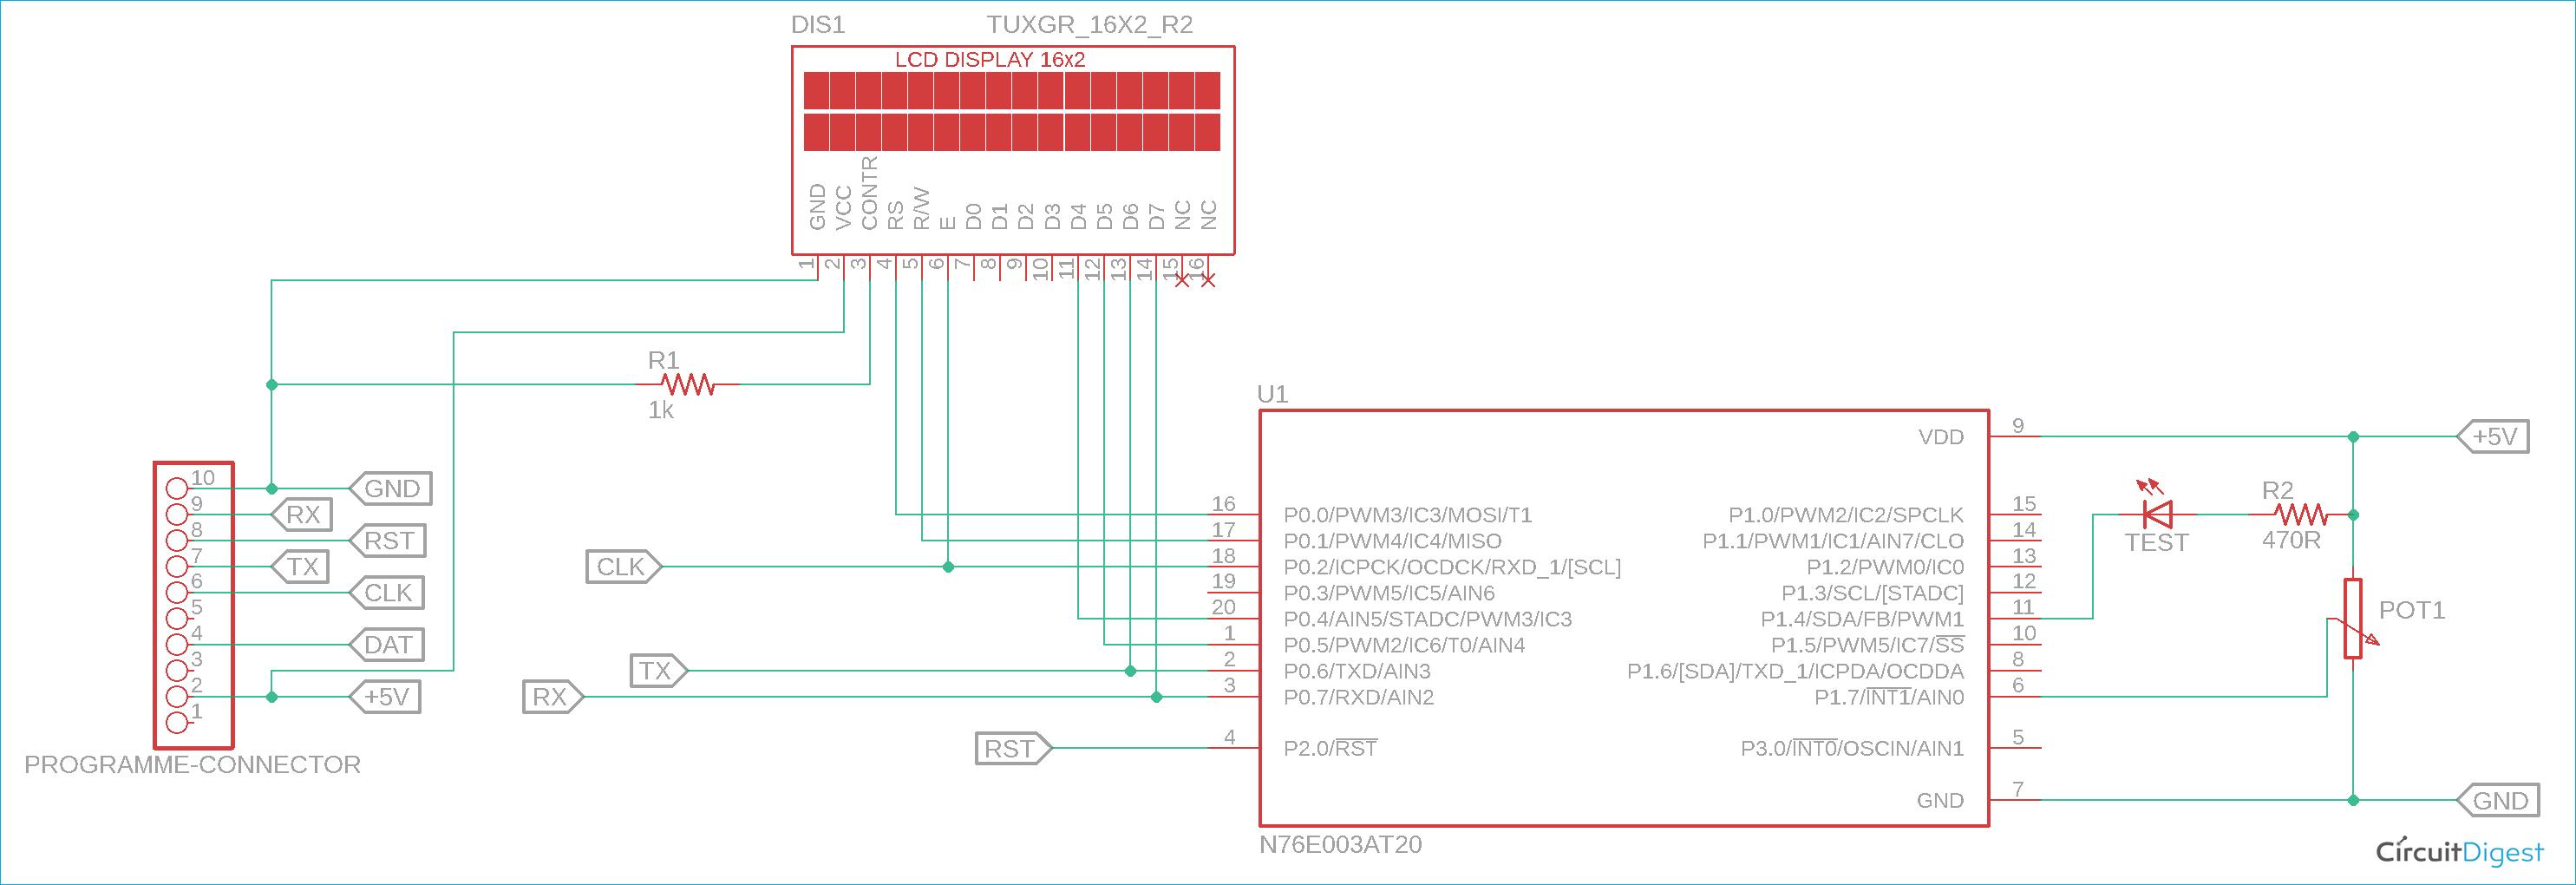 Nuvoton N76E003 Circuit Diagram